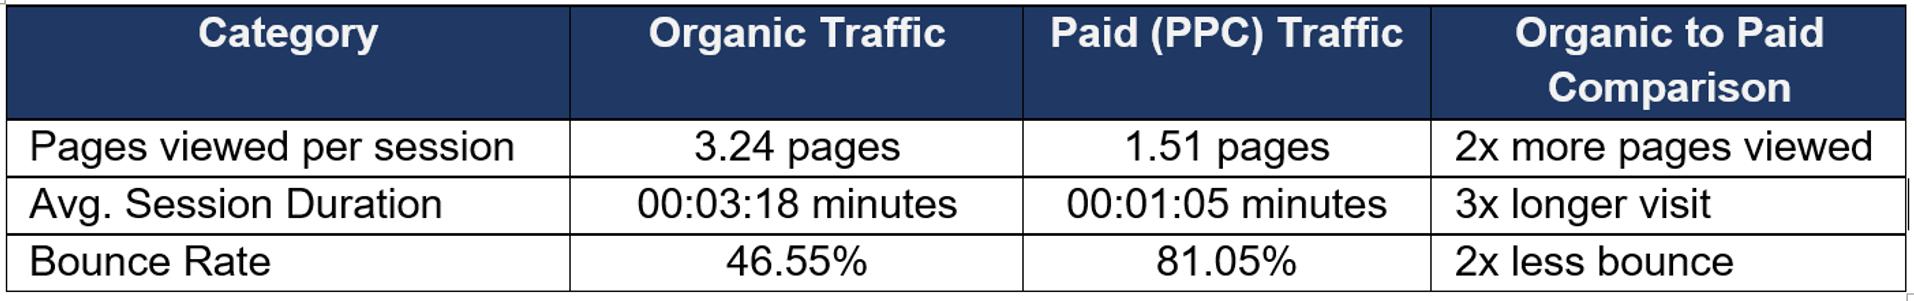 PPC vs Organic Traffic